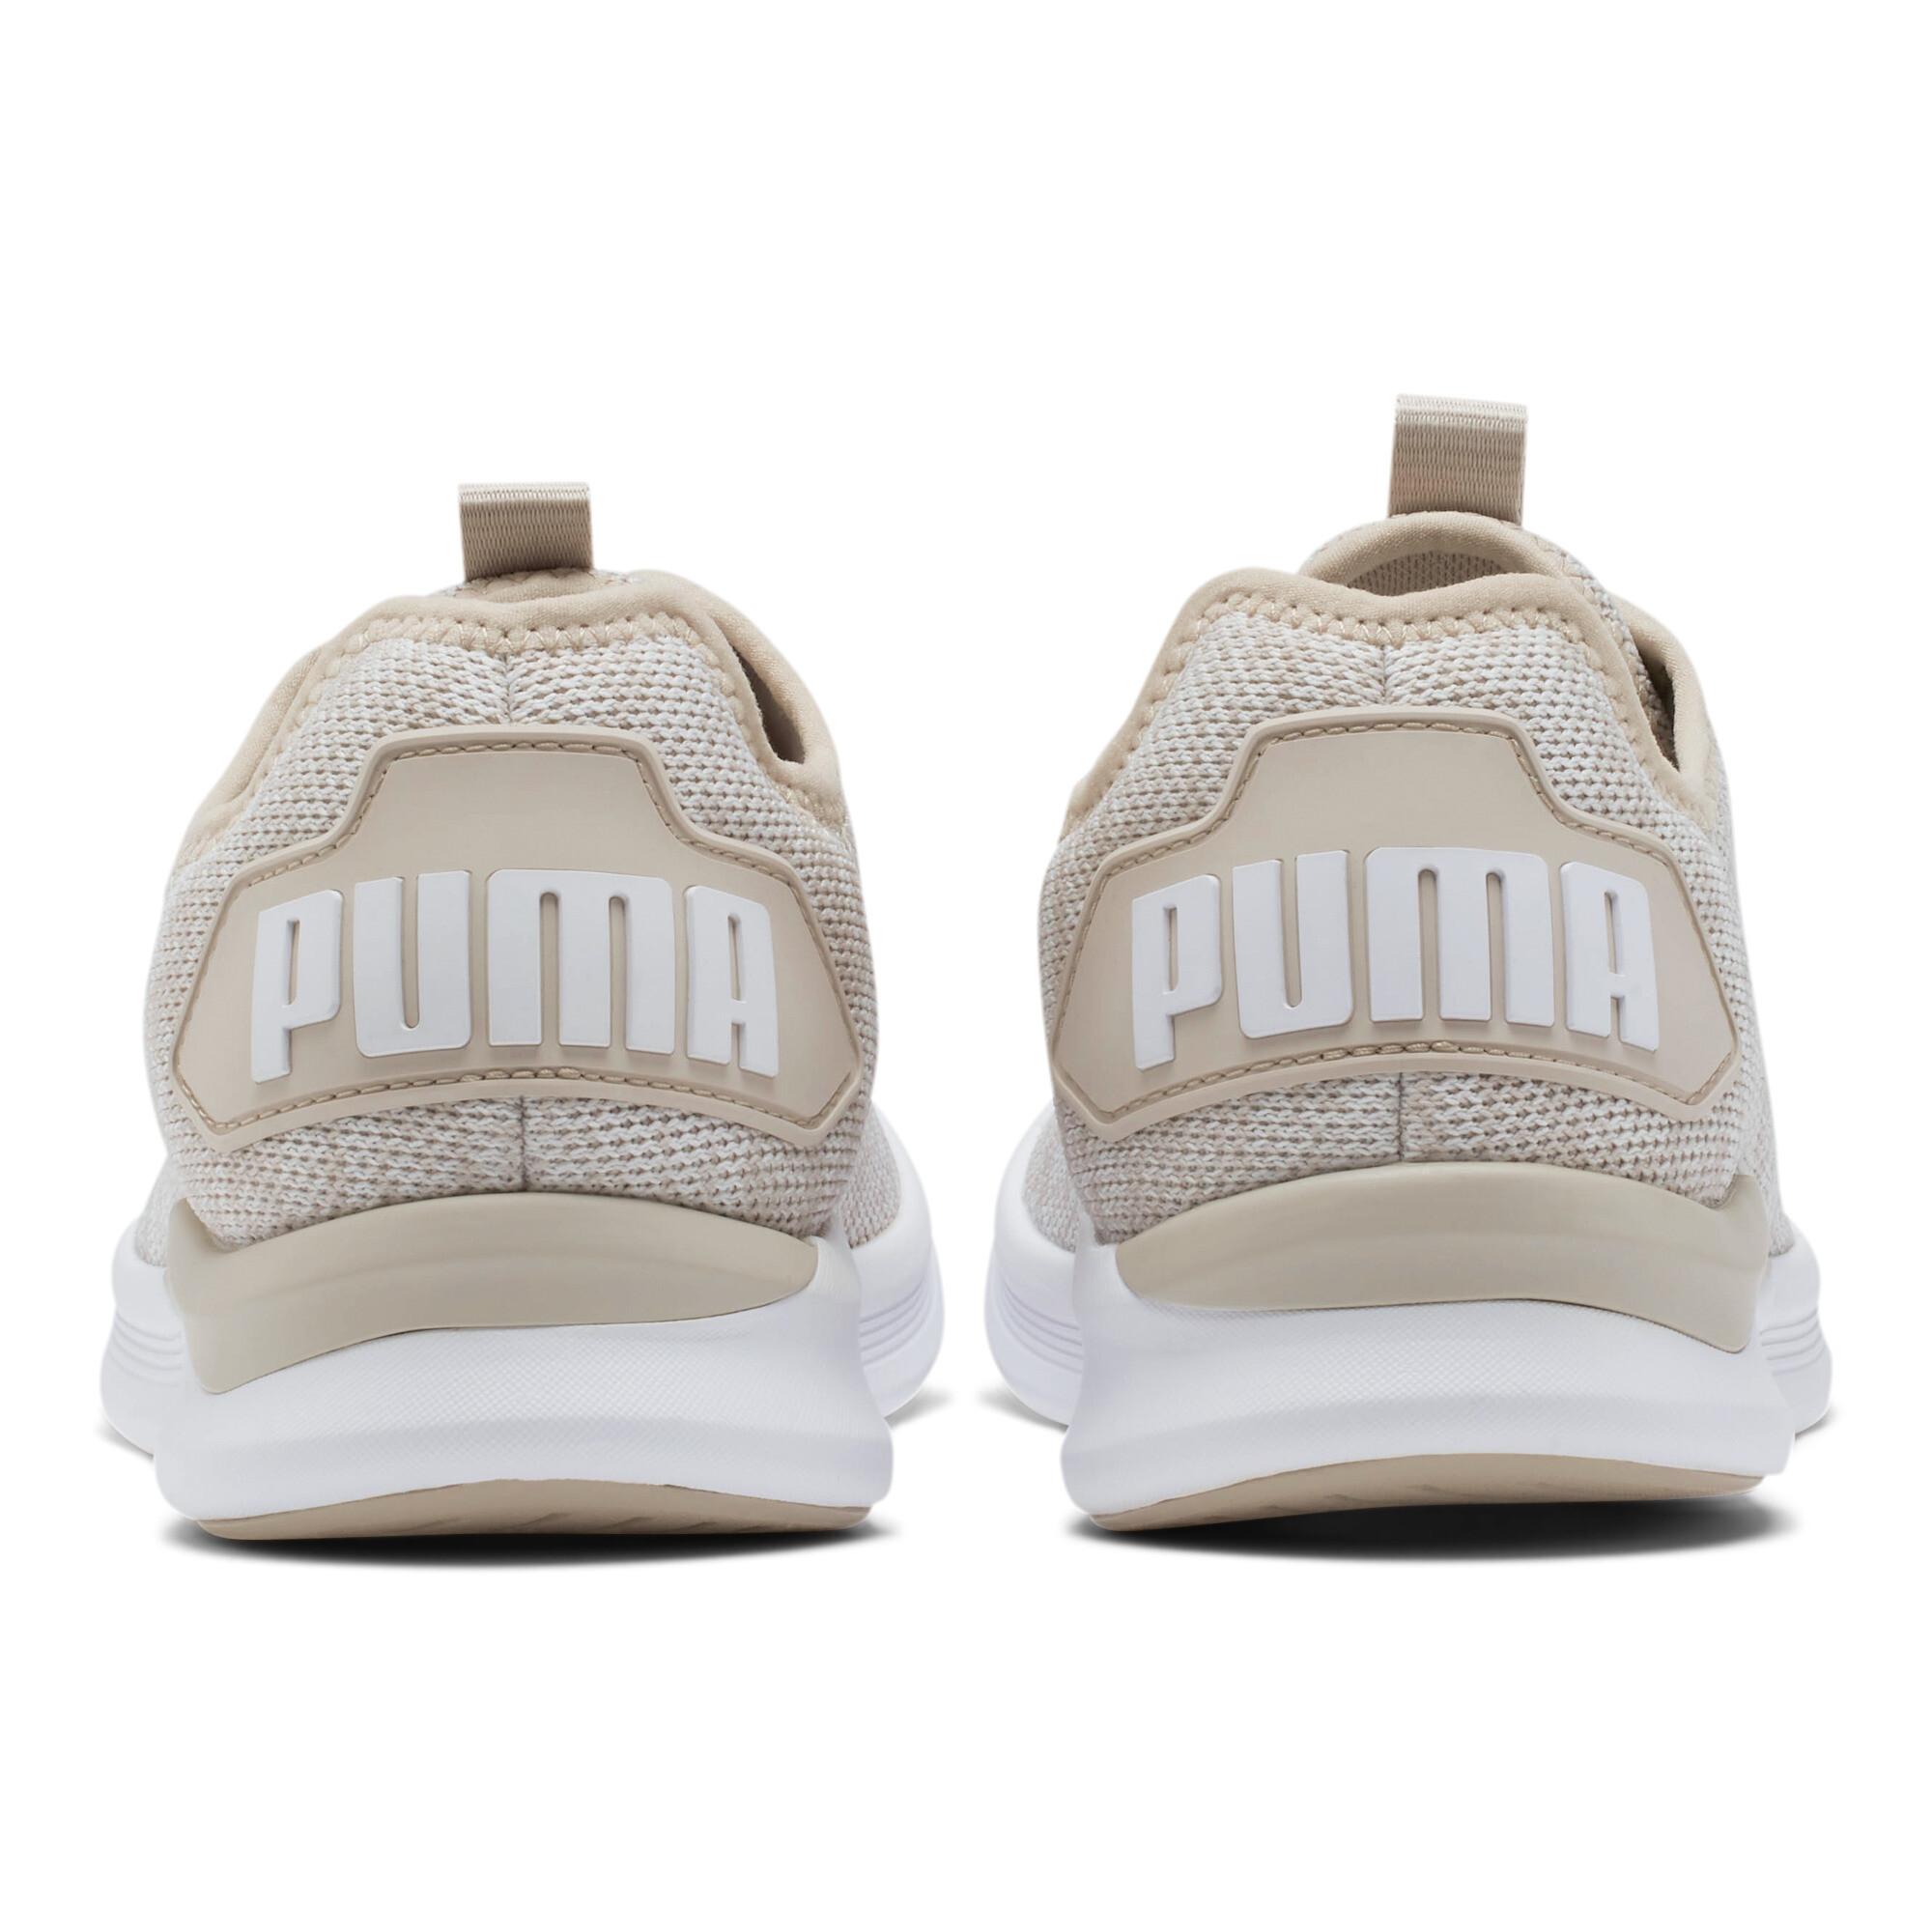 PUMA-Ballast-Women-039-s-Running-Shoes-Women-Shoe-Running thumbnail 23